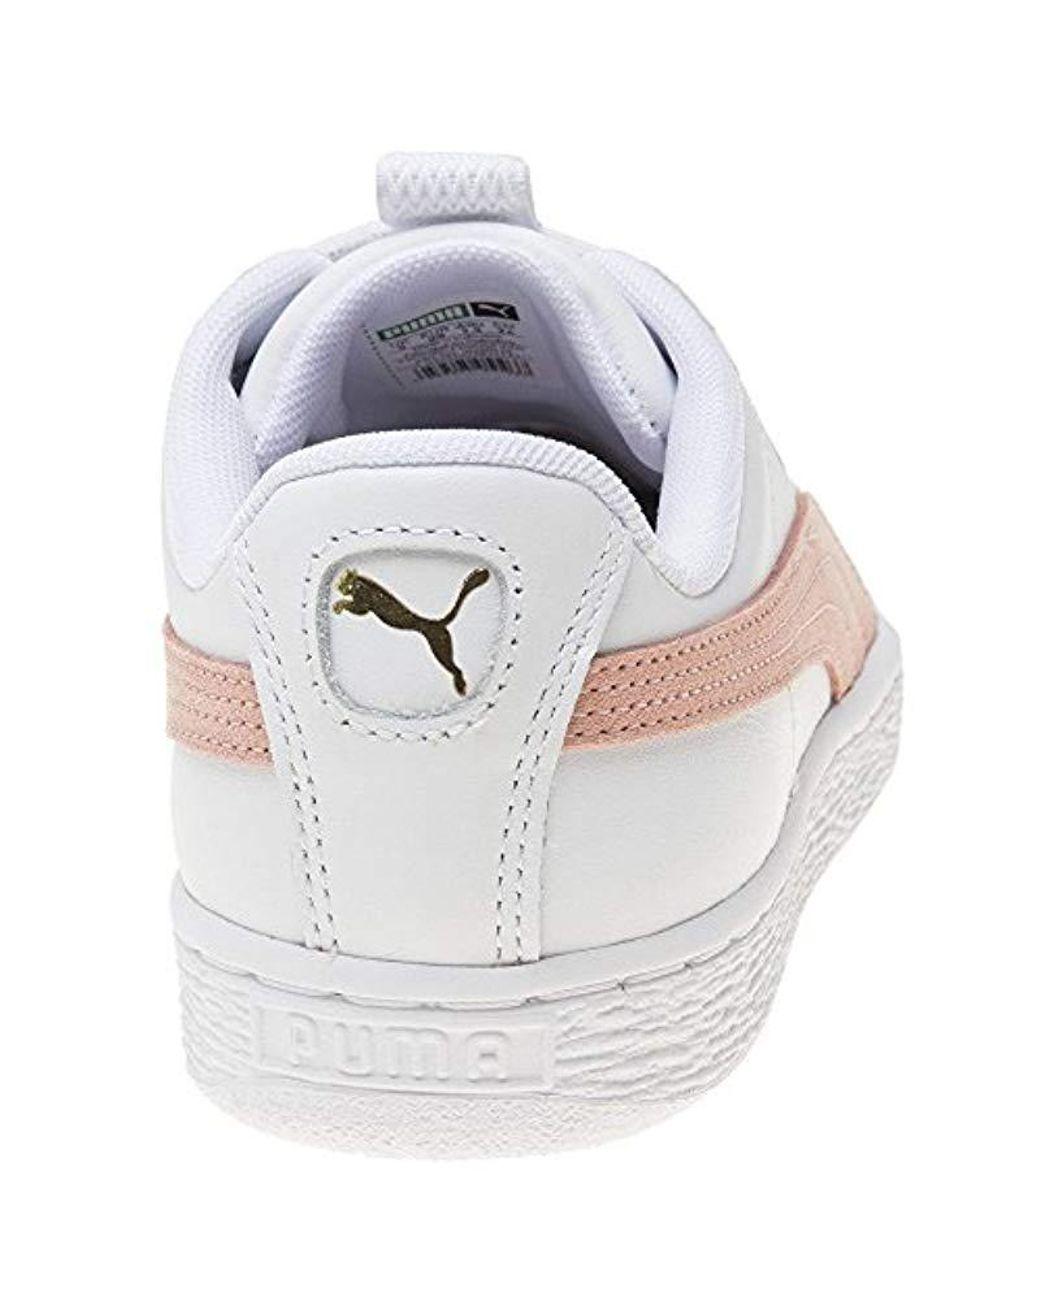 Maze Femme Basket Coloris En Blanc Wn'sSneakers Lea Puma Basses pGSzUVqM